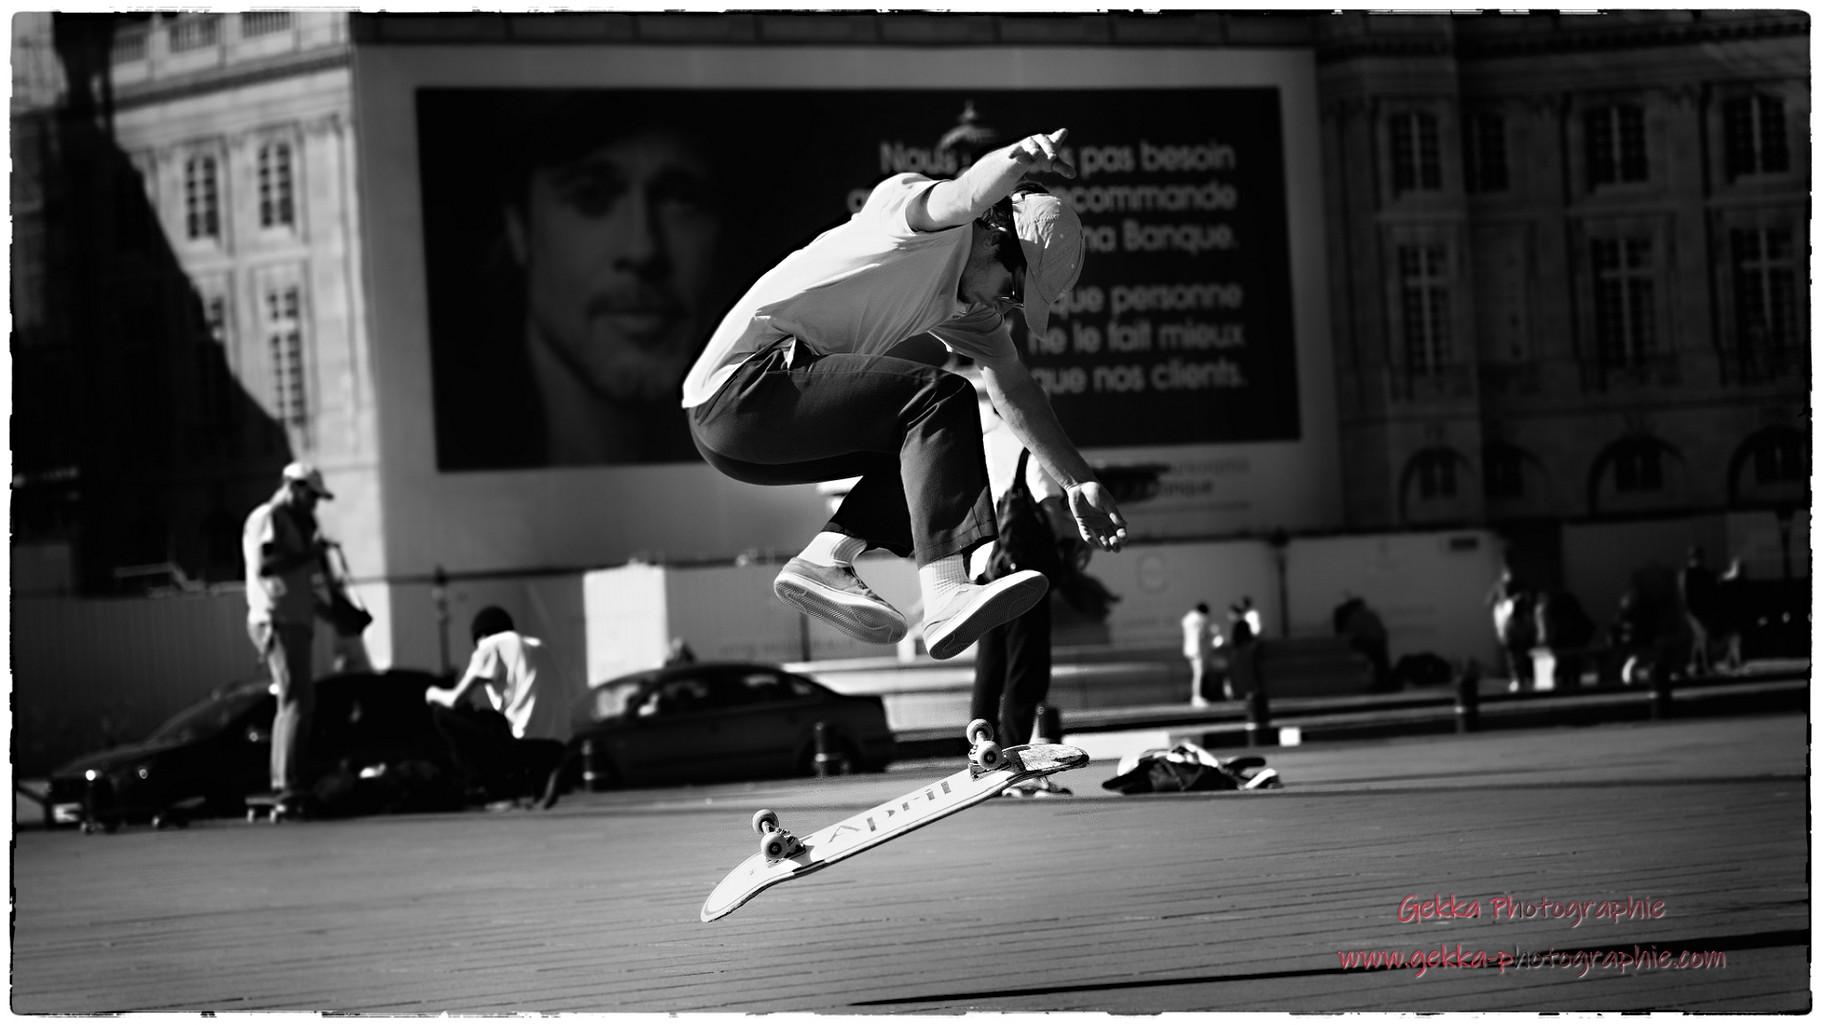 skate-bordeaux_gekka-photographie.jpg